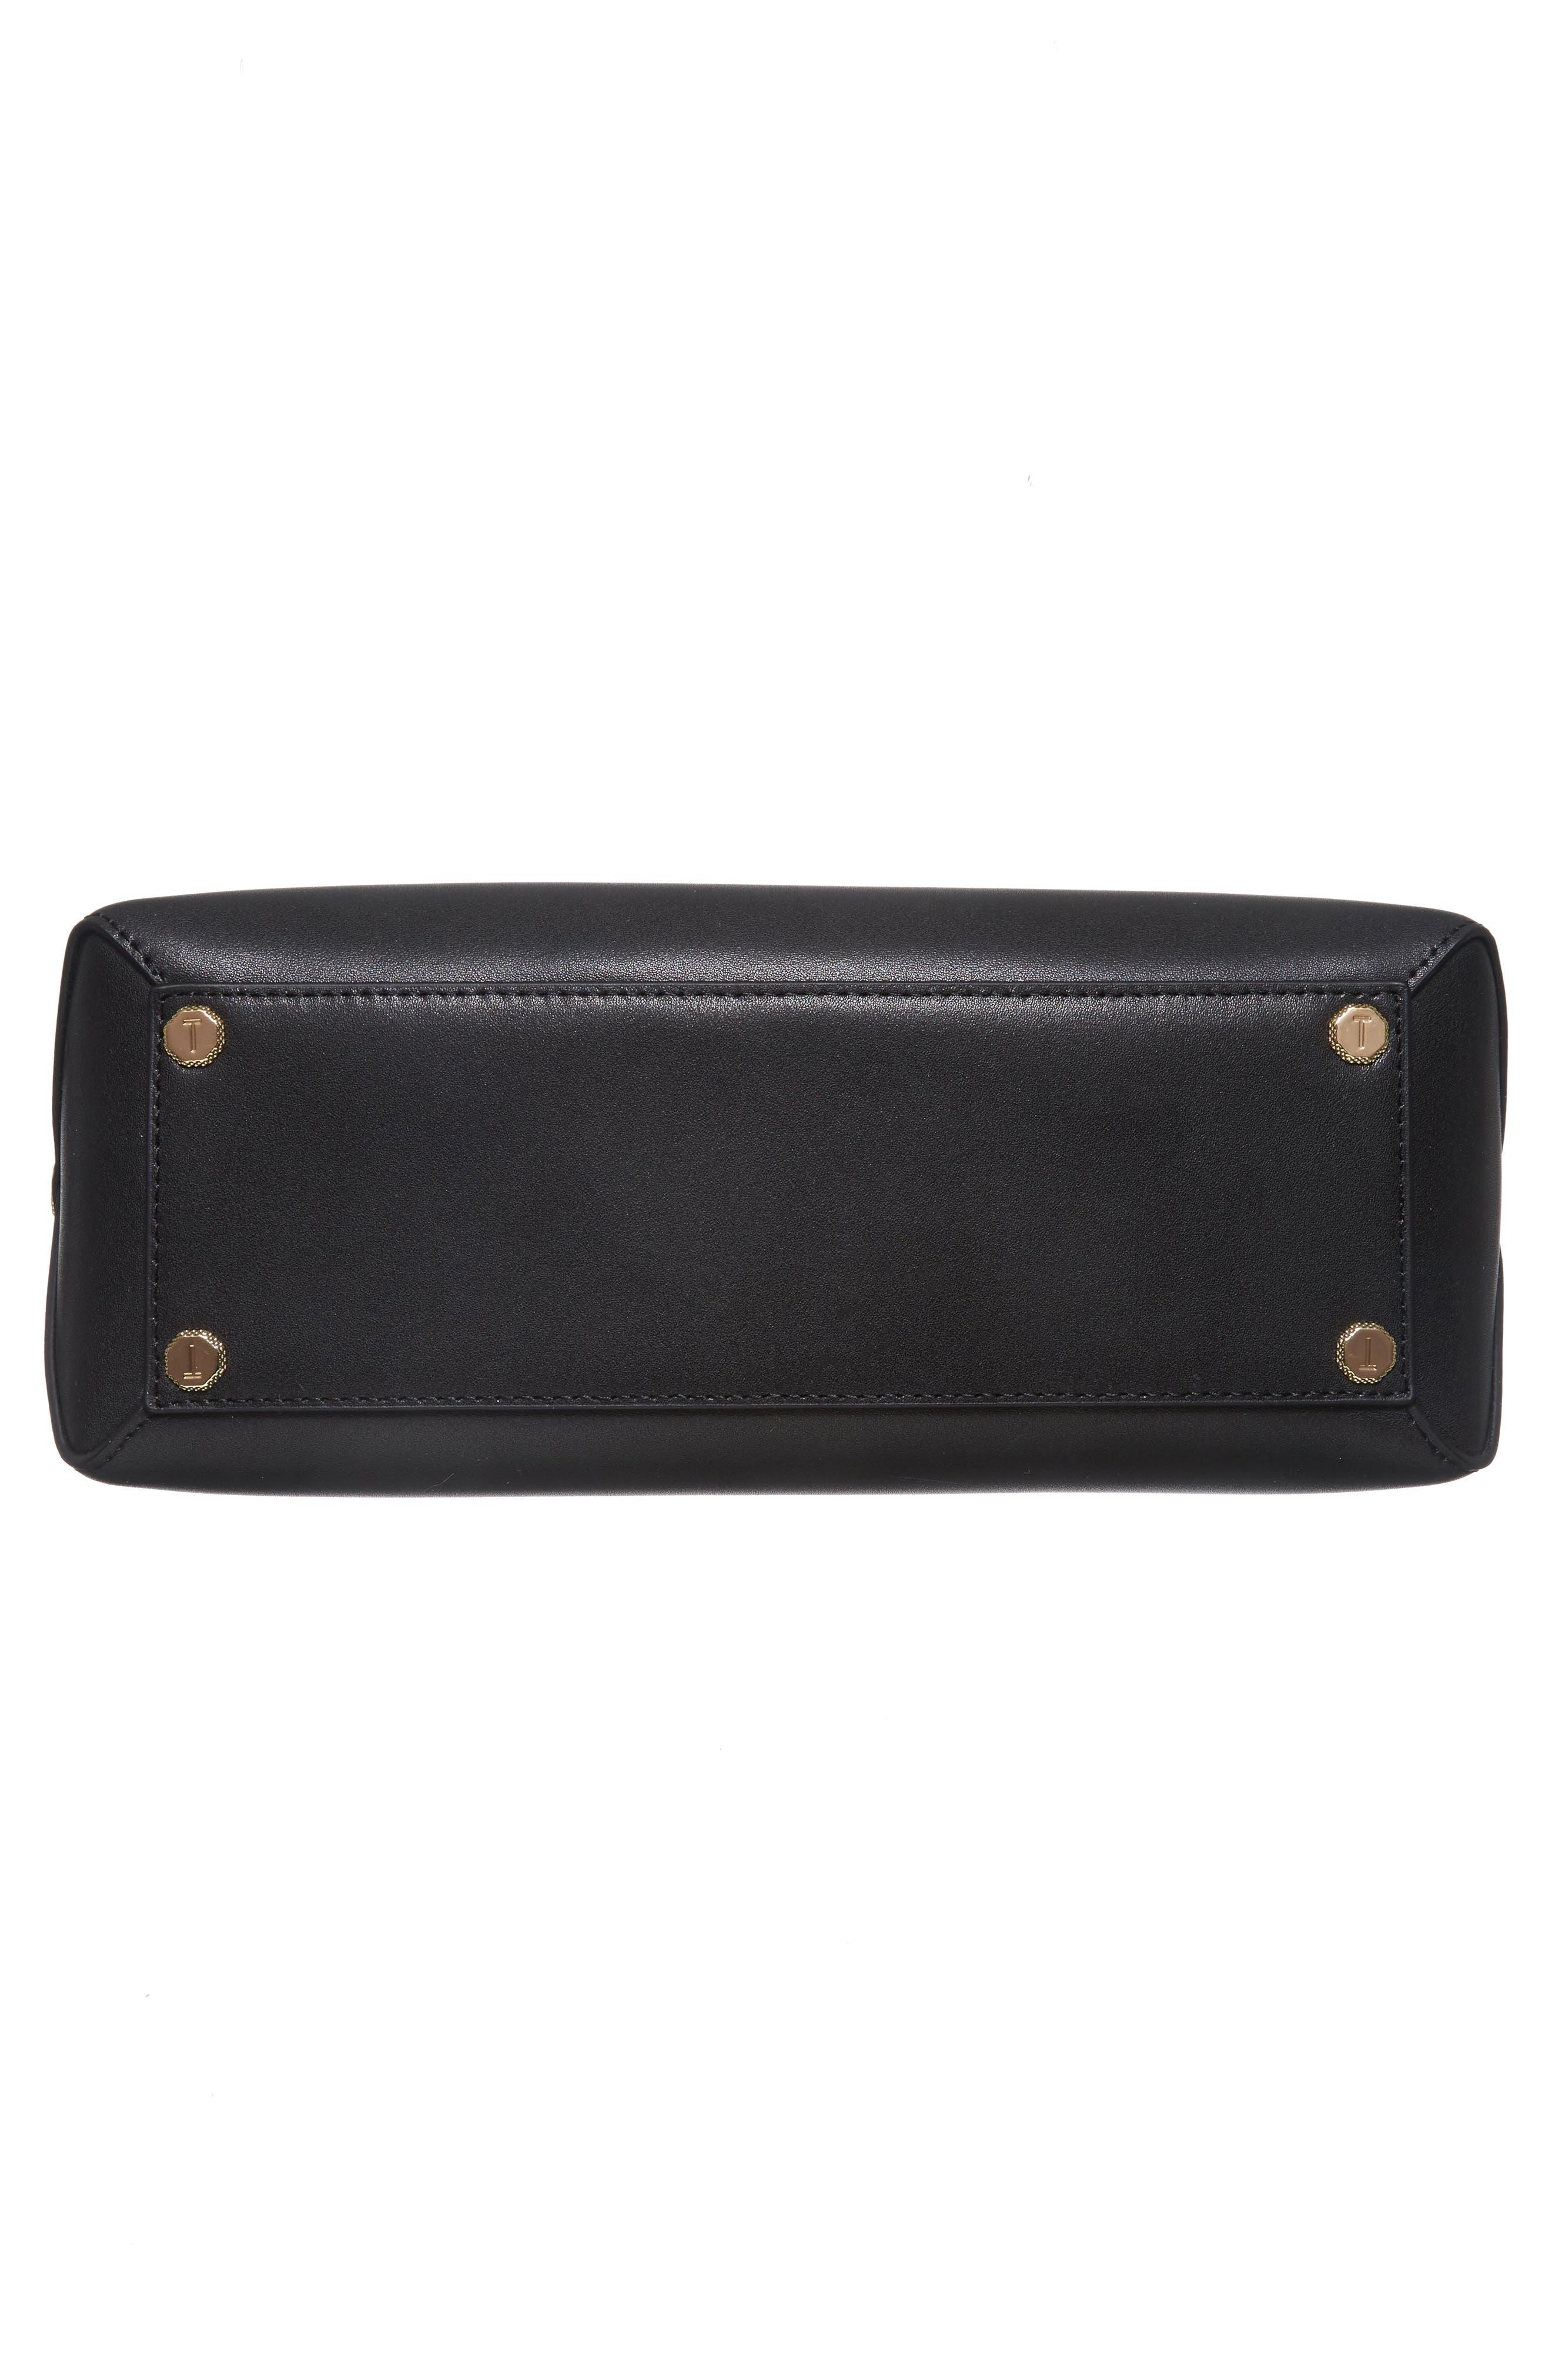 Taymar - Studded Edge Lady Bag Leather Top Handle Satchel,                             Alternate thumbnail 5, color,                             Black